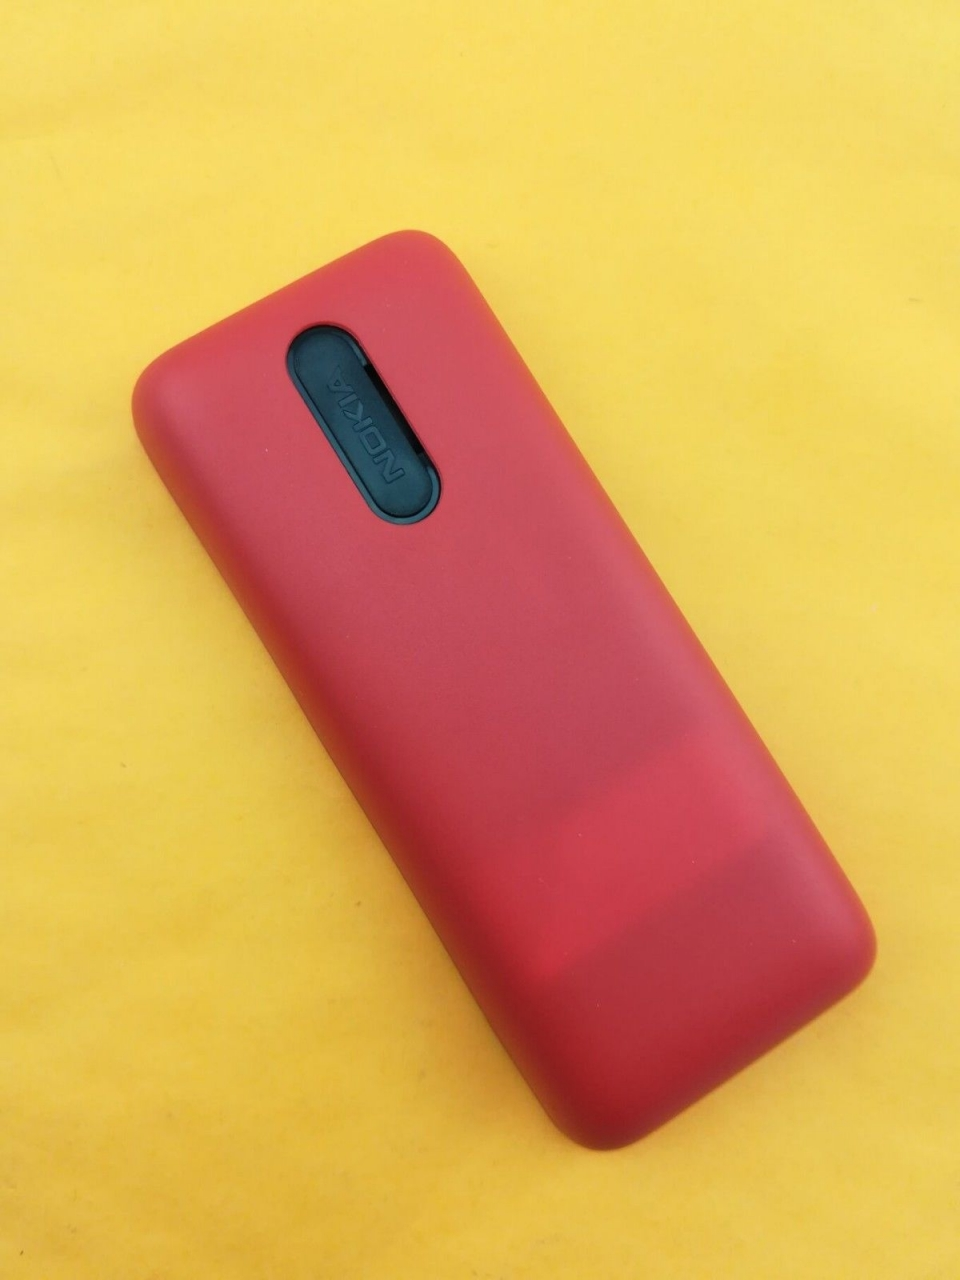 new Nokia 106 Unlocked Simple Mobile Phone Multiple keyboards languages white 10